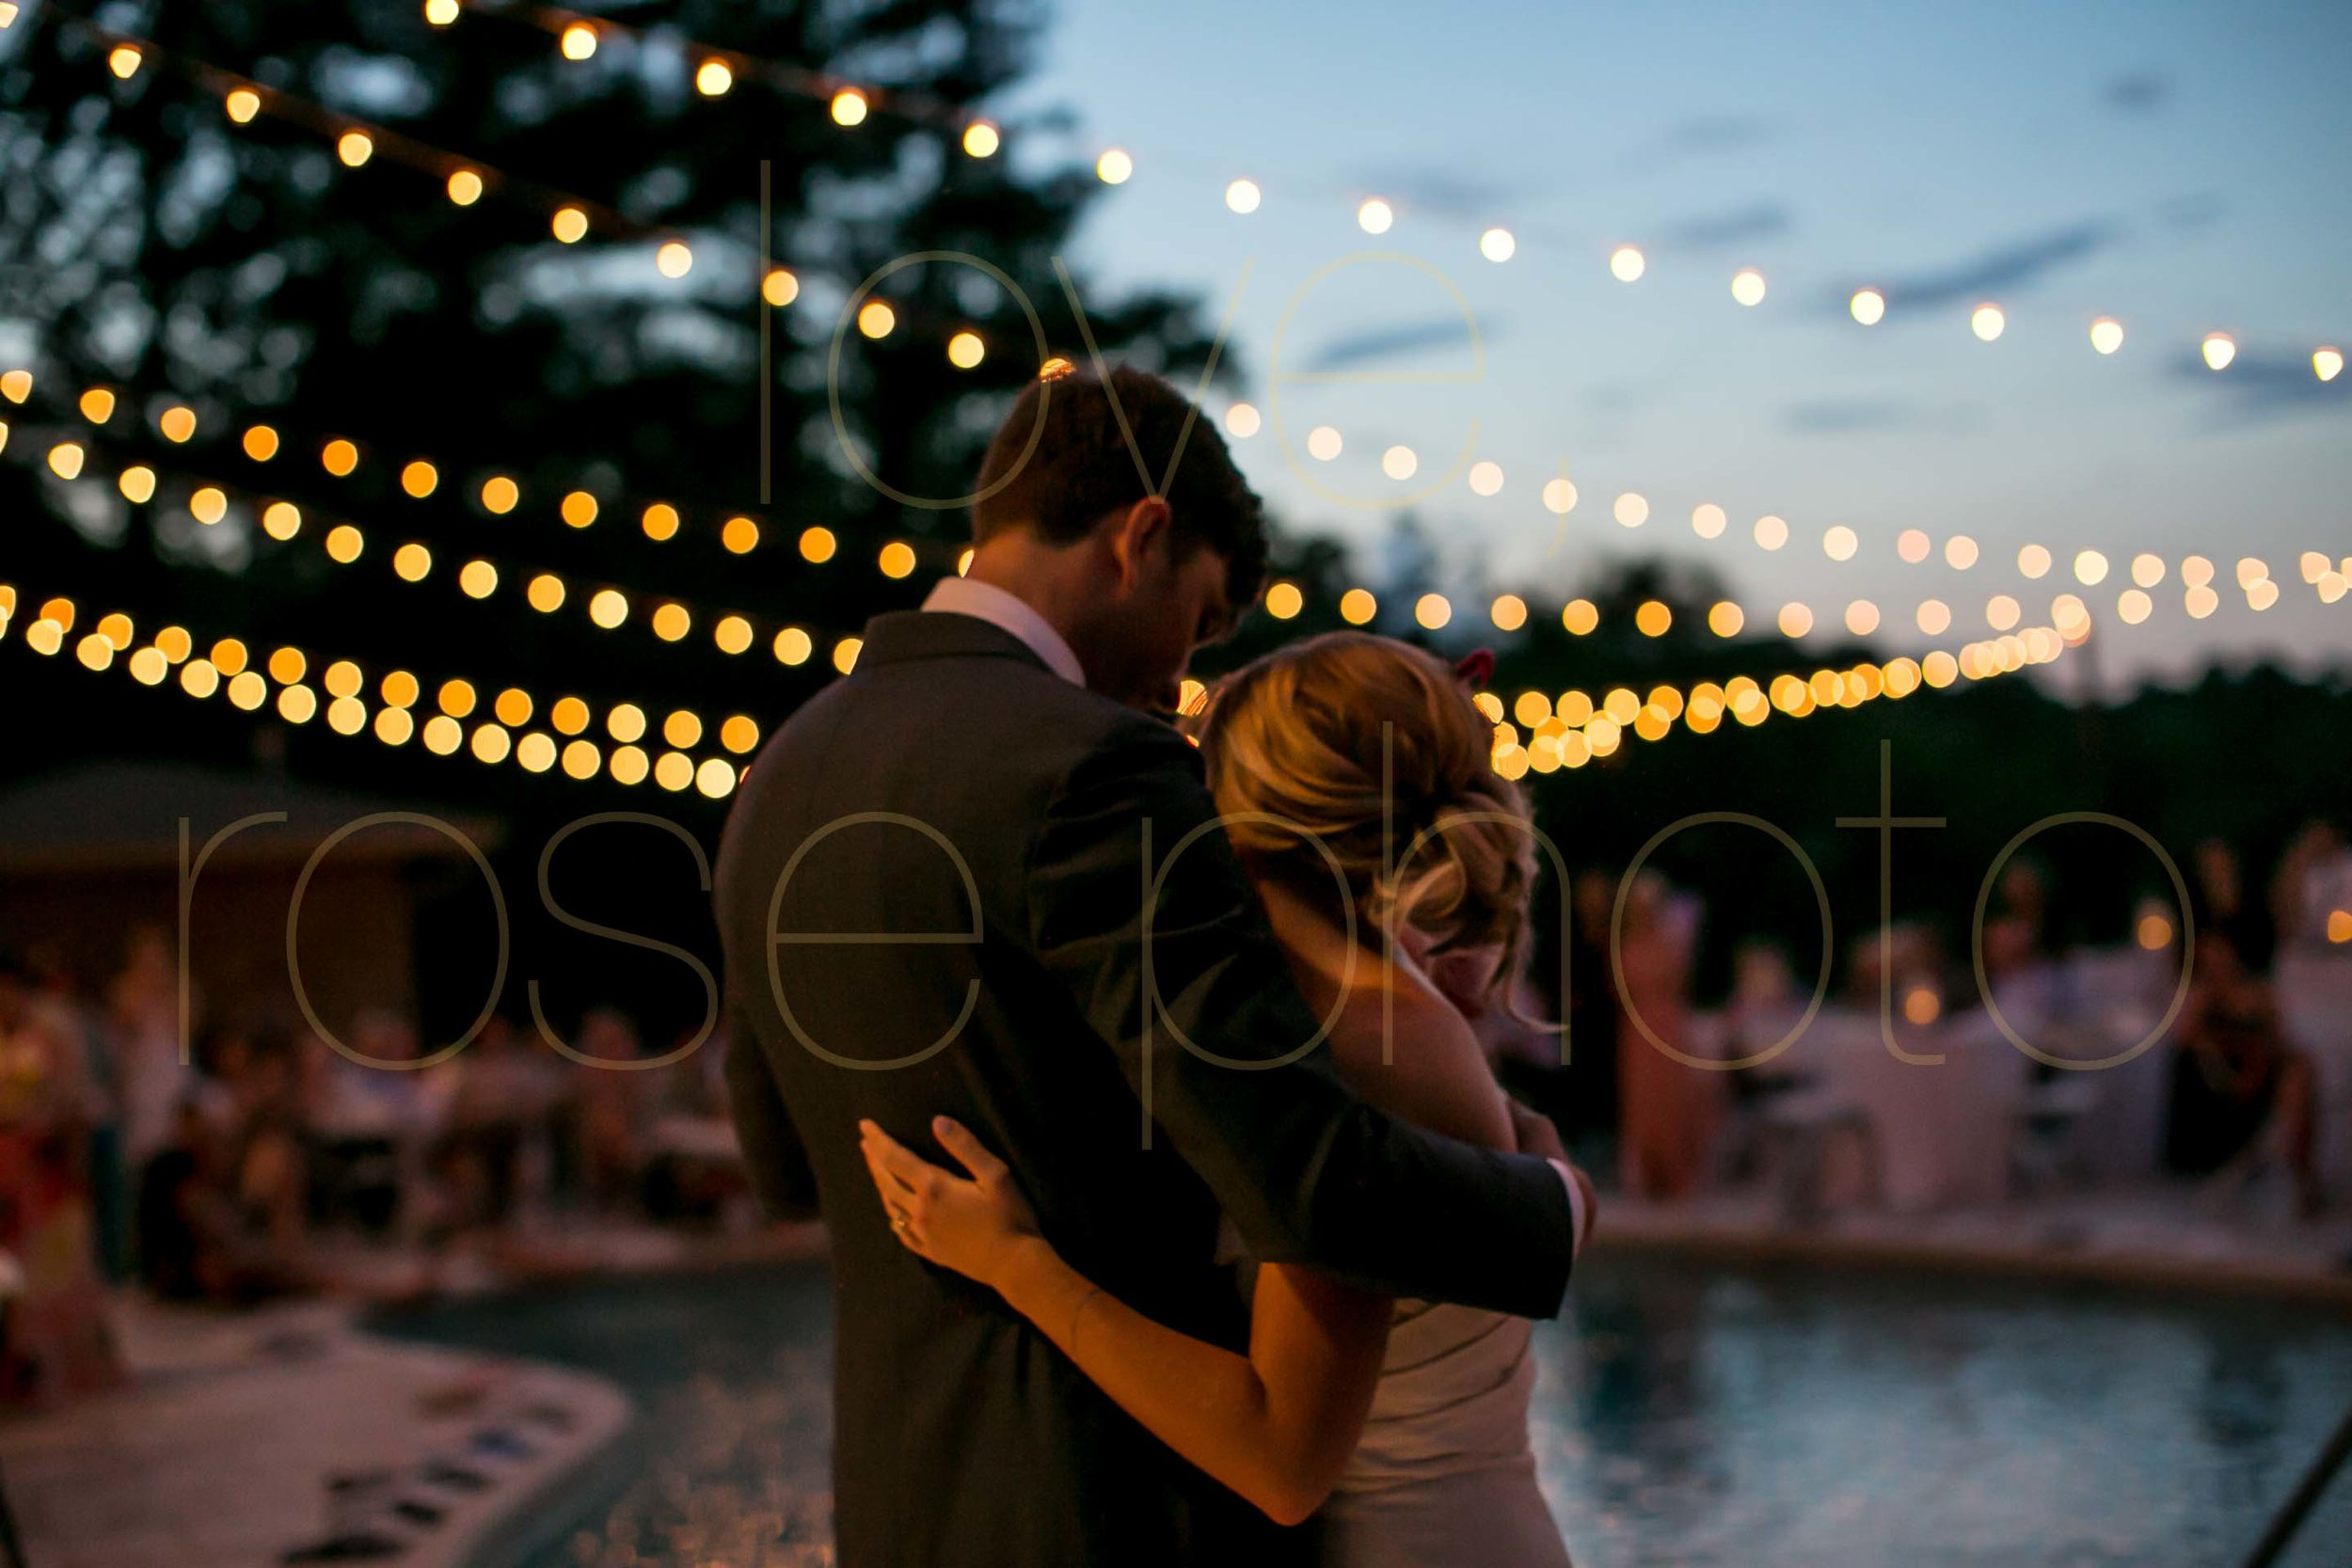 Rose Photo Asheville Wedding Photographer Nasheville Weddings Charleston Bride Chicago photojournalist weddings -56.jpg